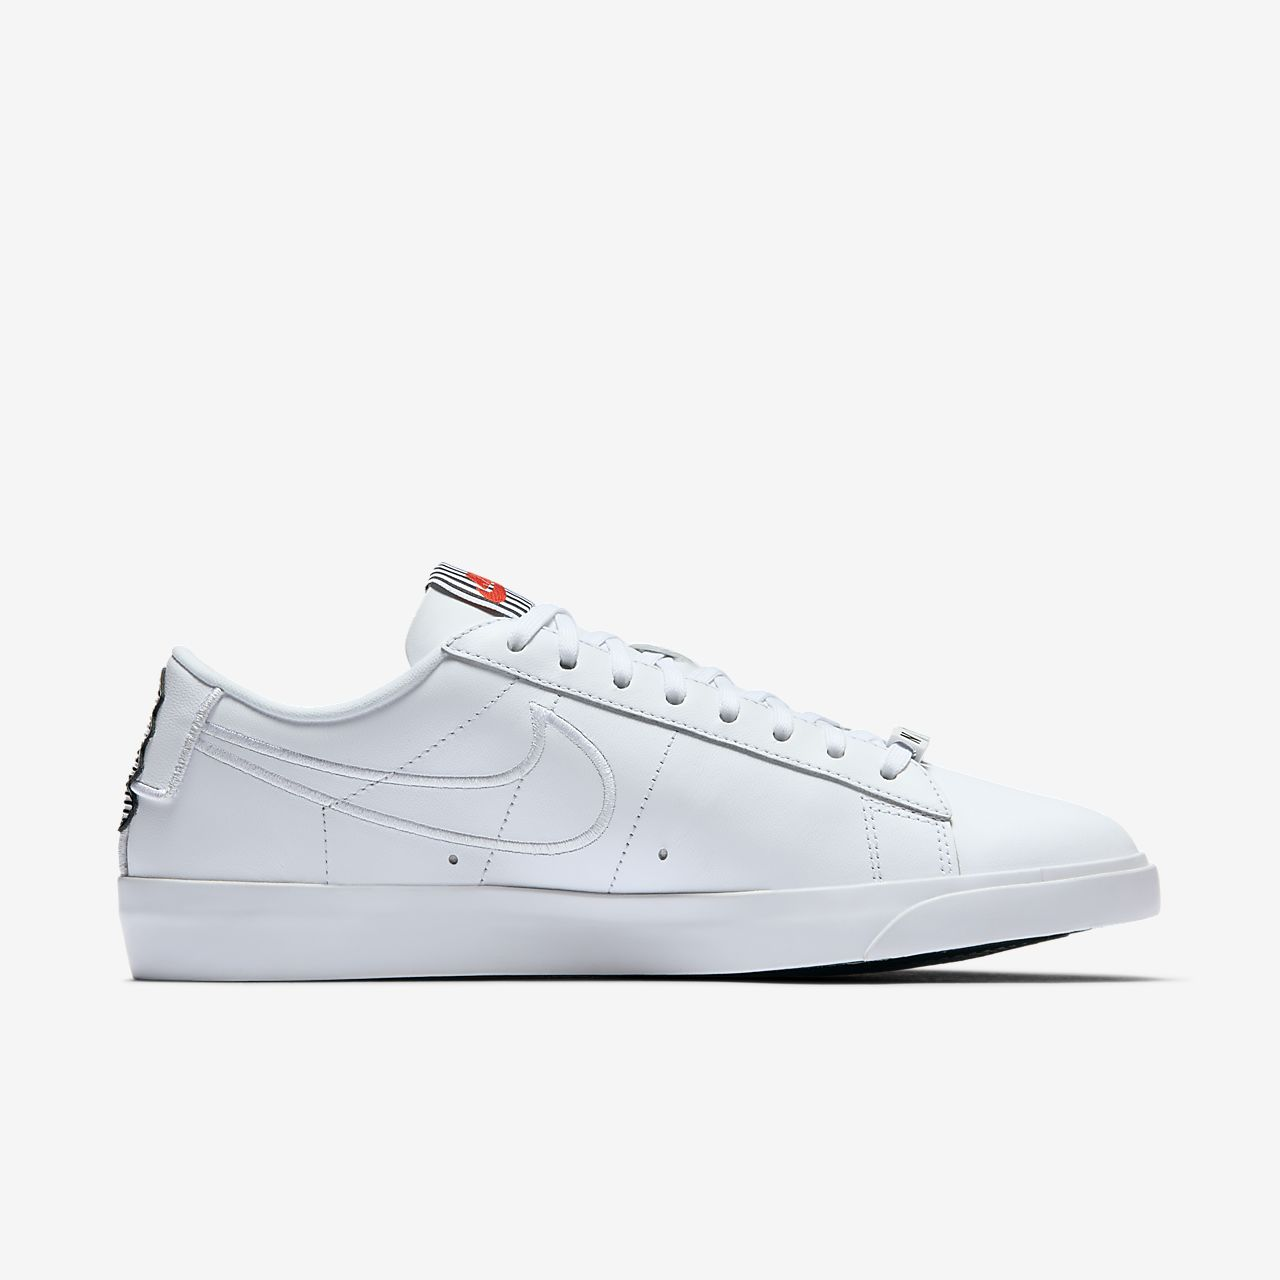 ... Chaussure Nike Blazer Low SE LX pour Femme